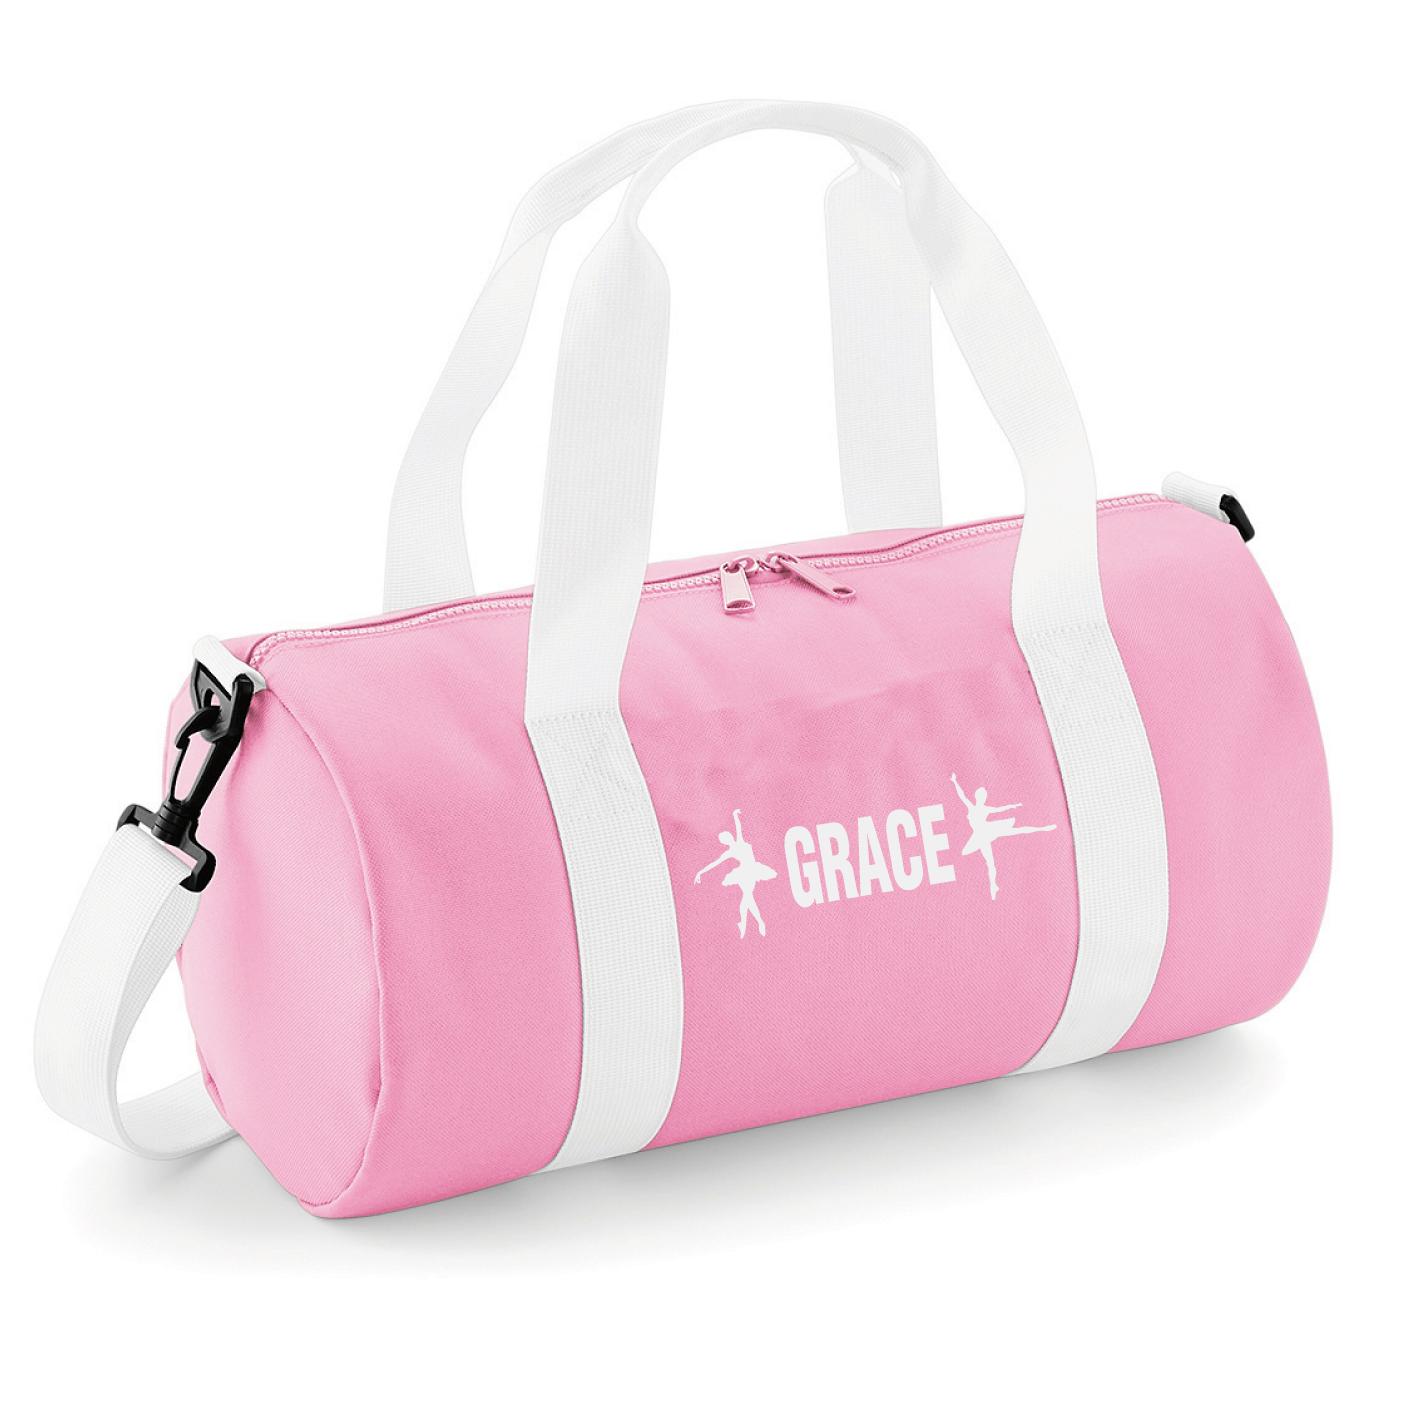 Personalised Name Gymnast Junior Dance Bag School Dance Girls Gymnastics Gym